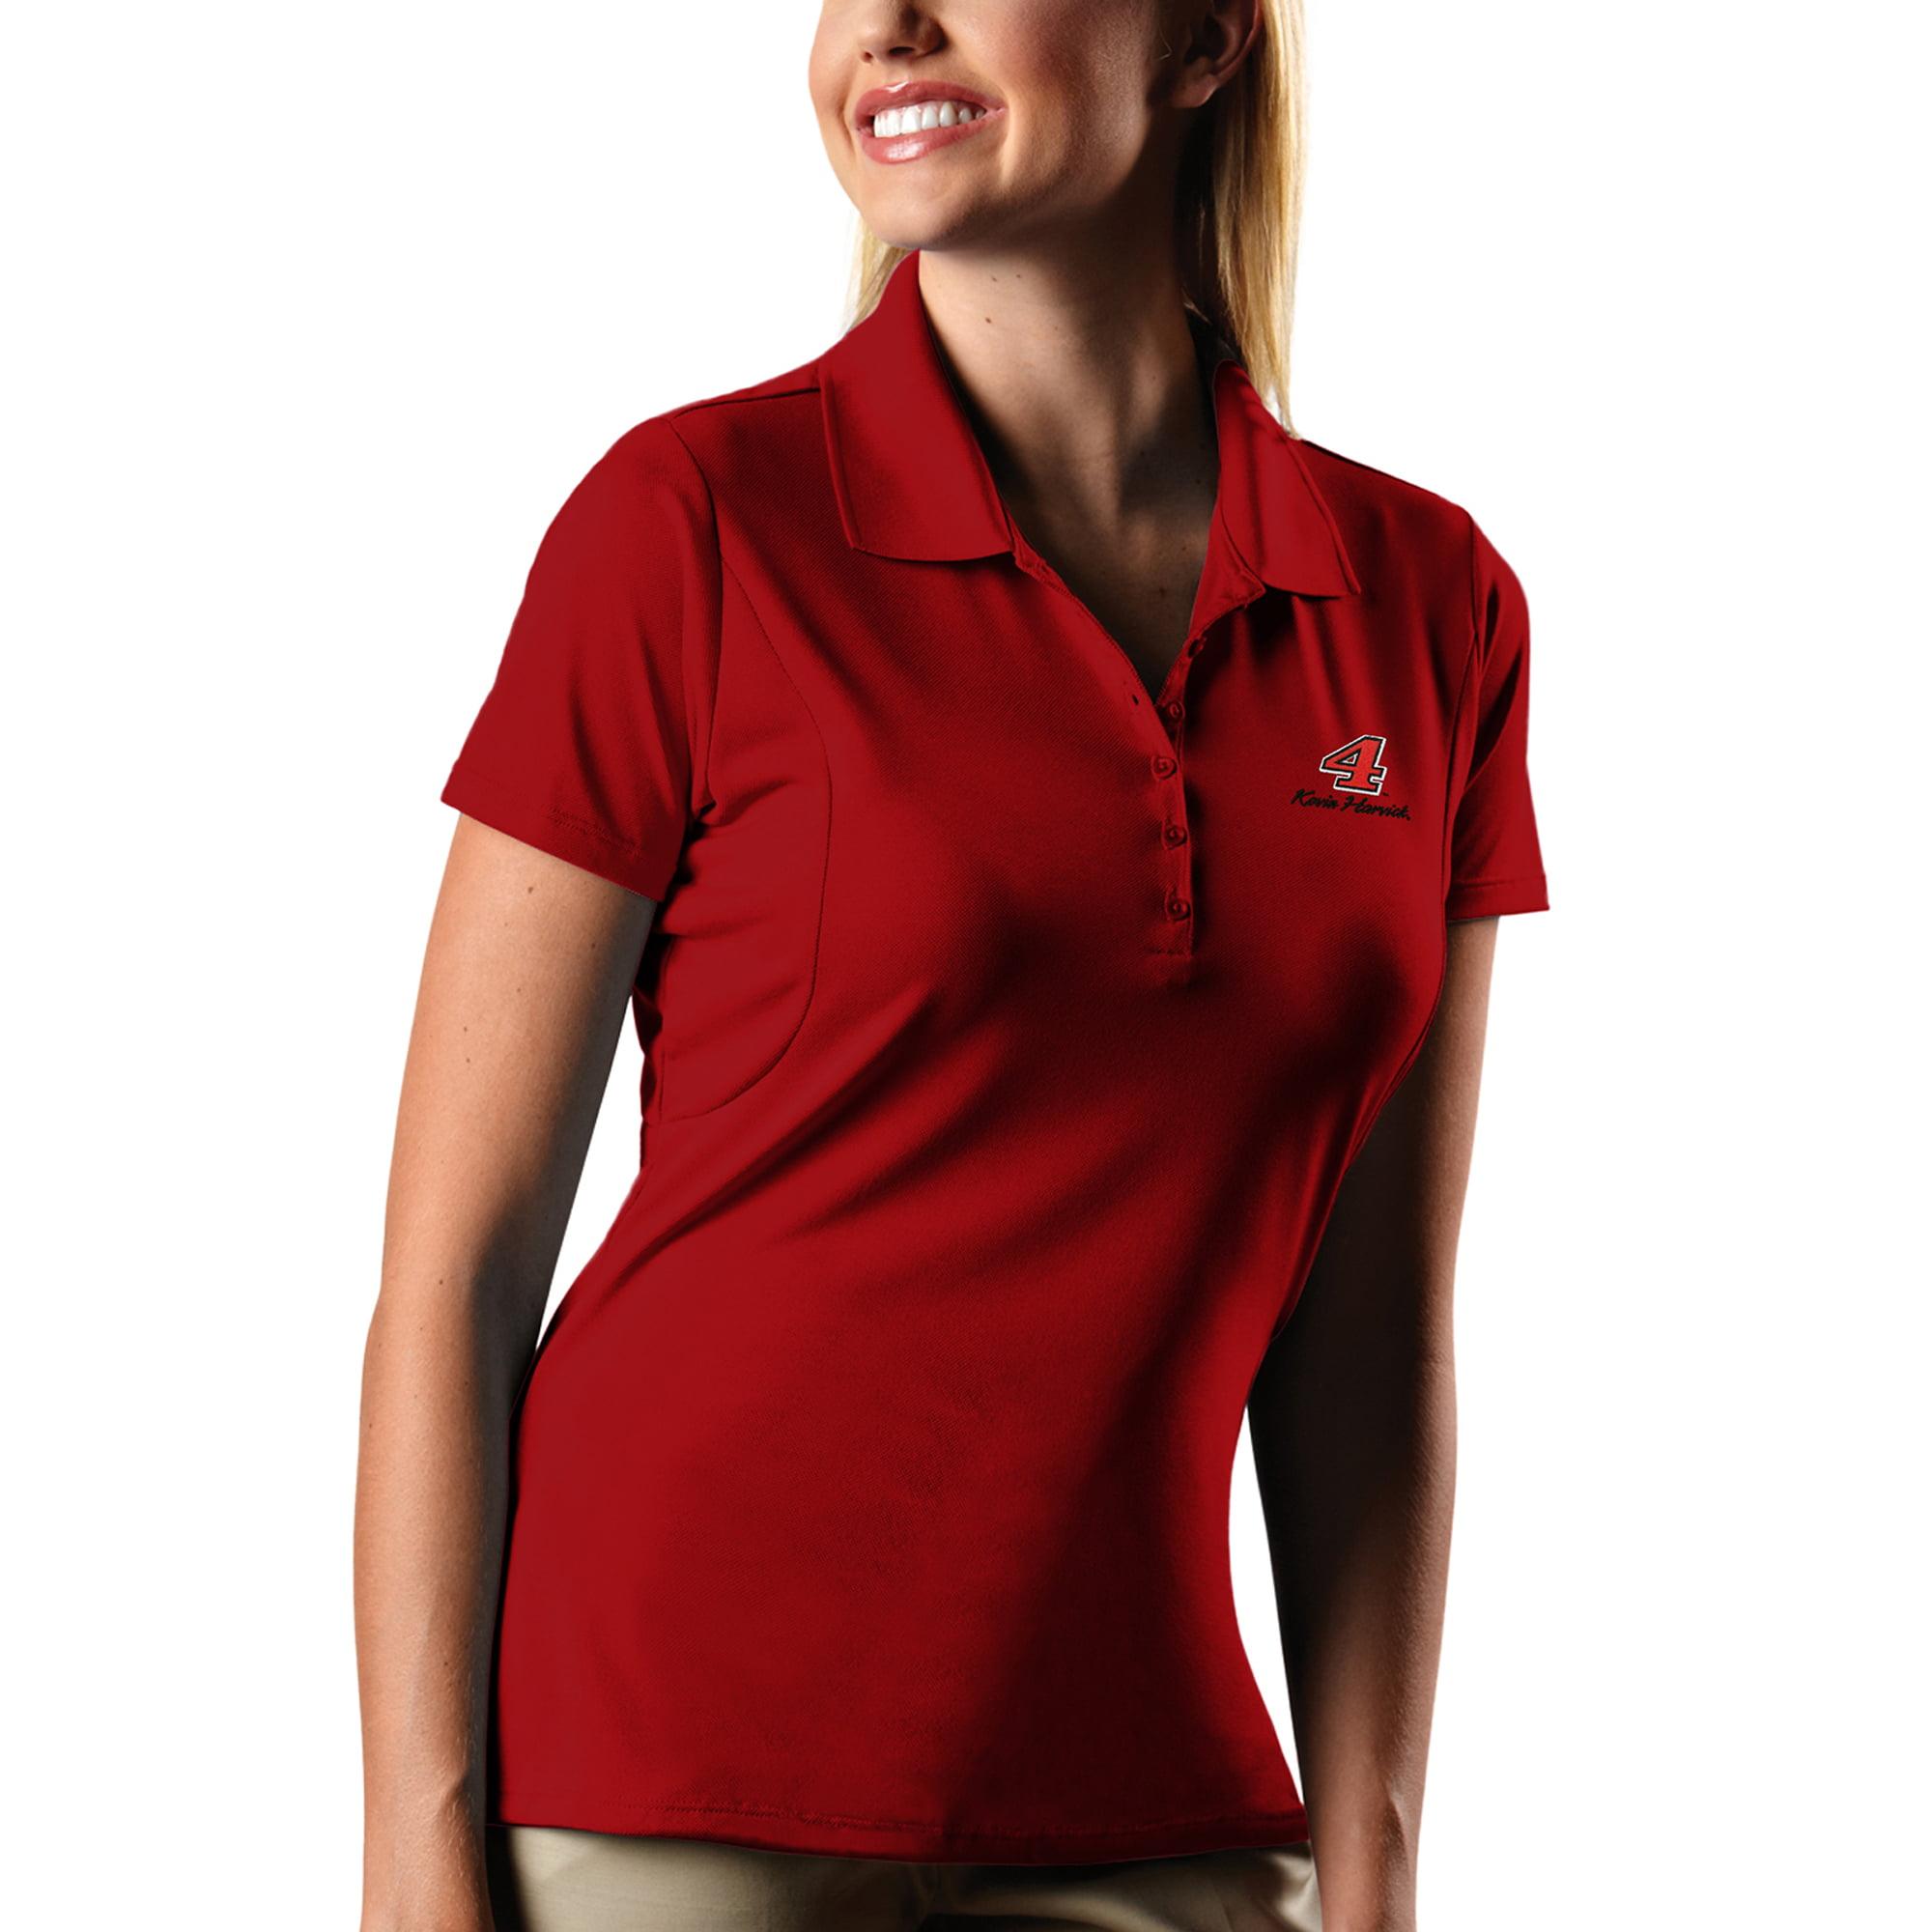 Kevin Harvick Women's Antigua Pique Desert Dry X-tra Lite Polo - Red